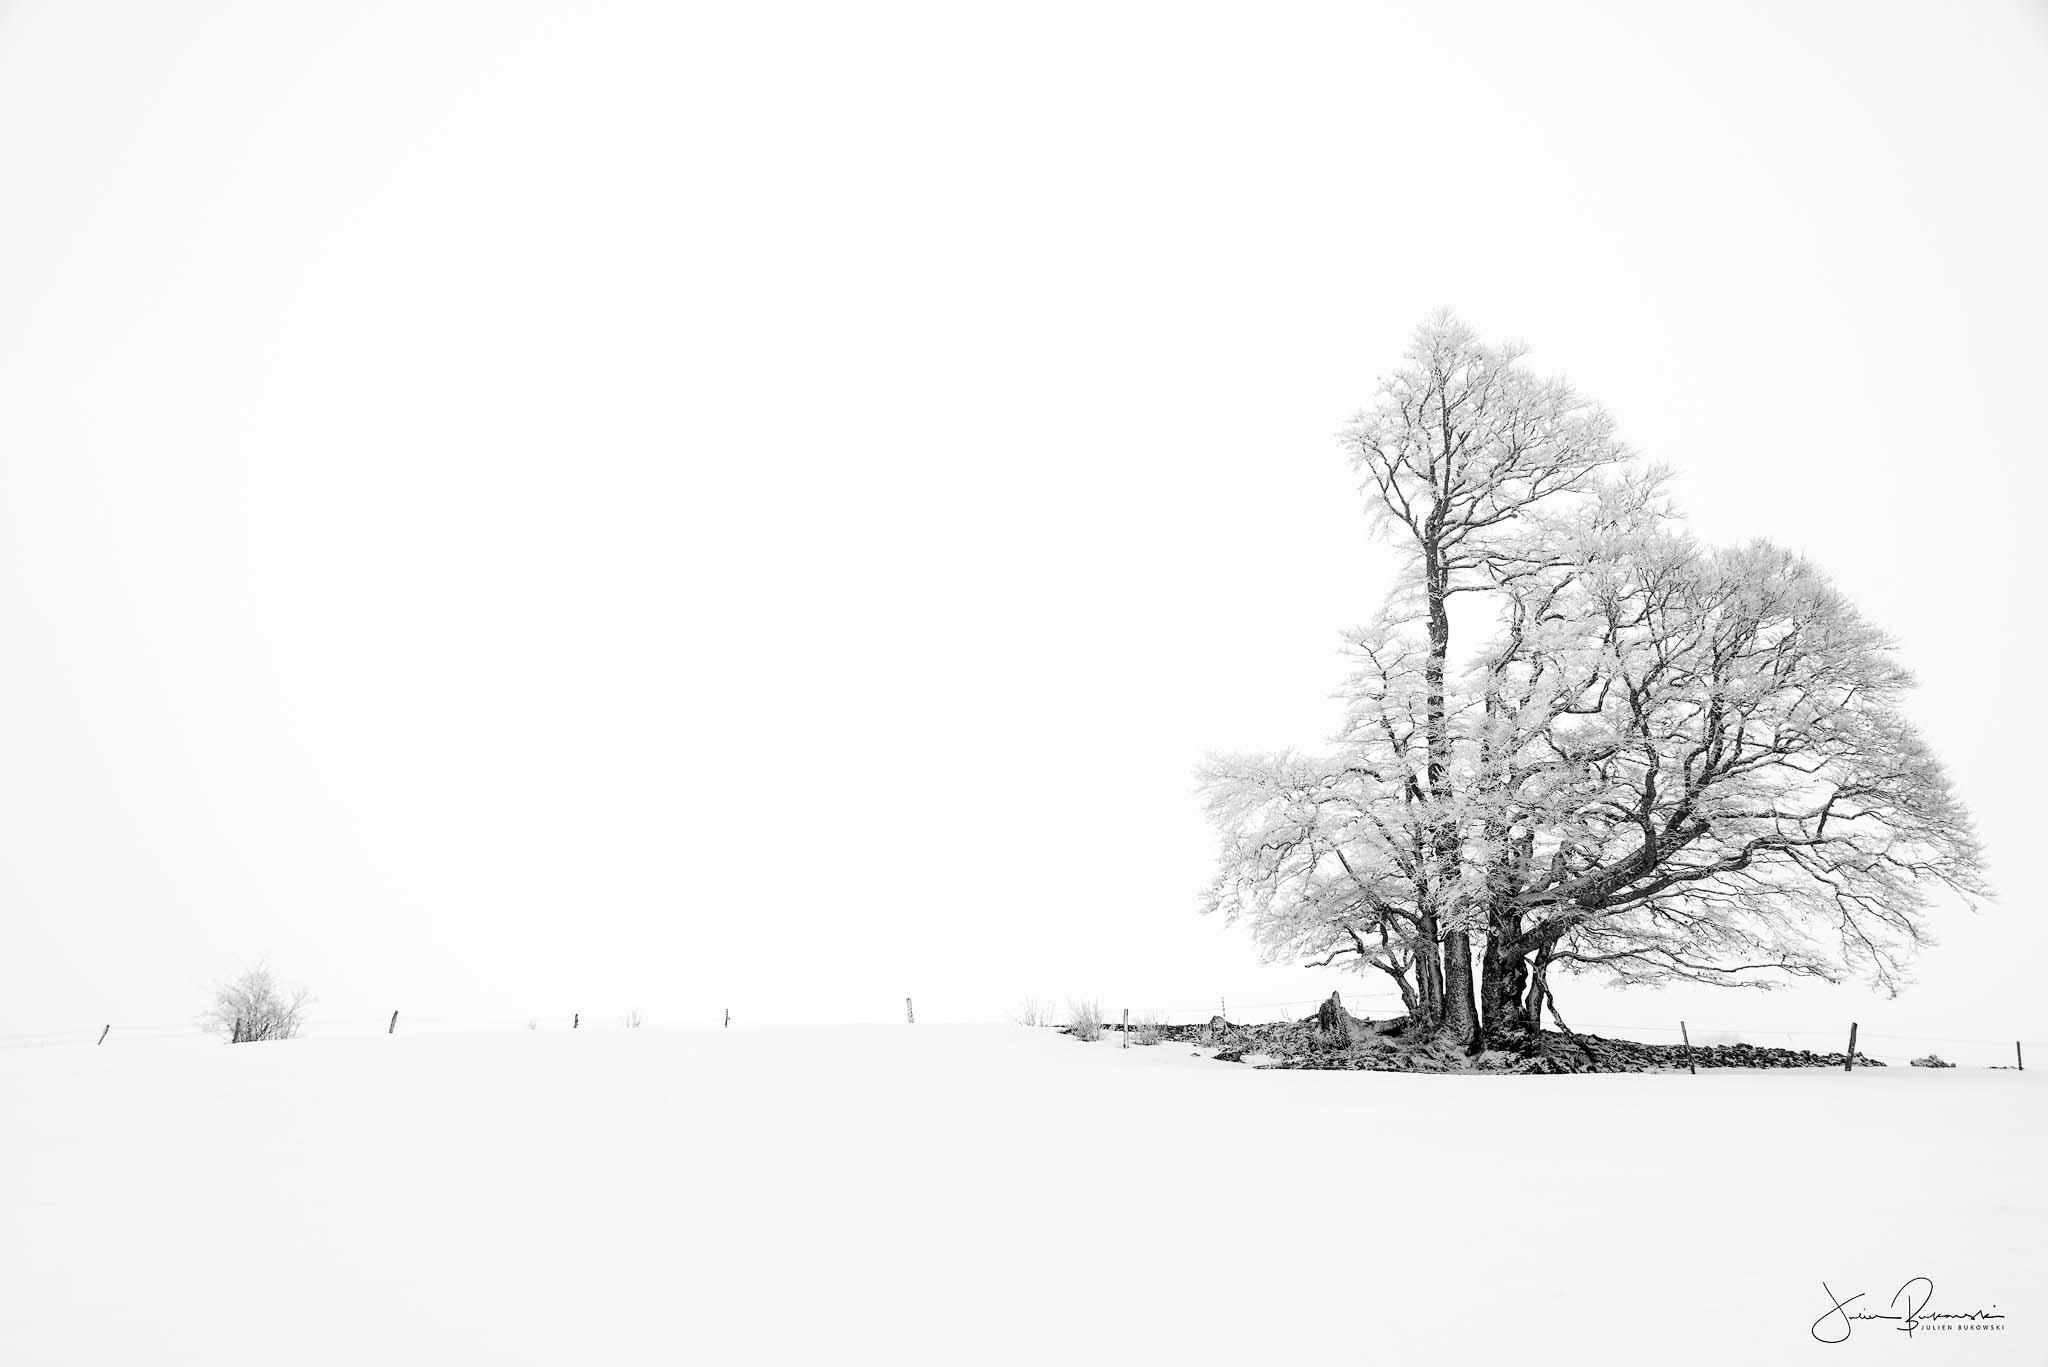 Solitude (Creux du Van - Suisse)